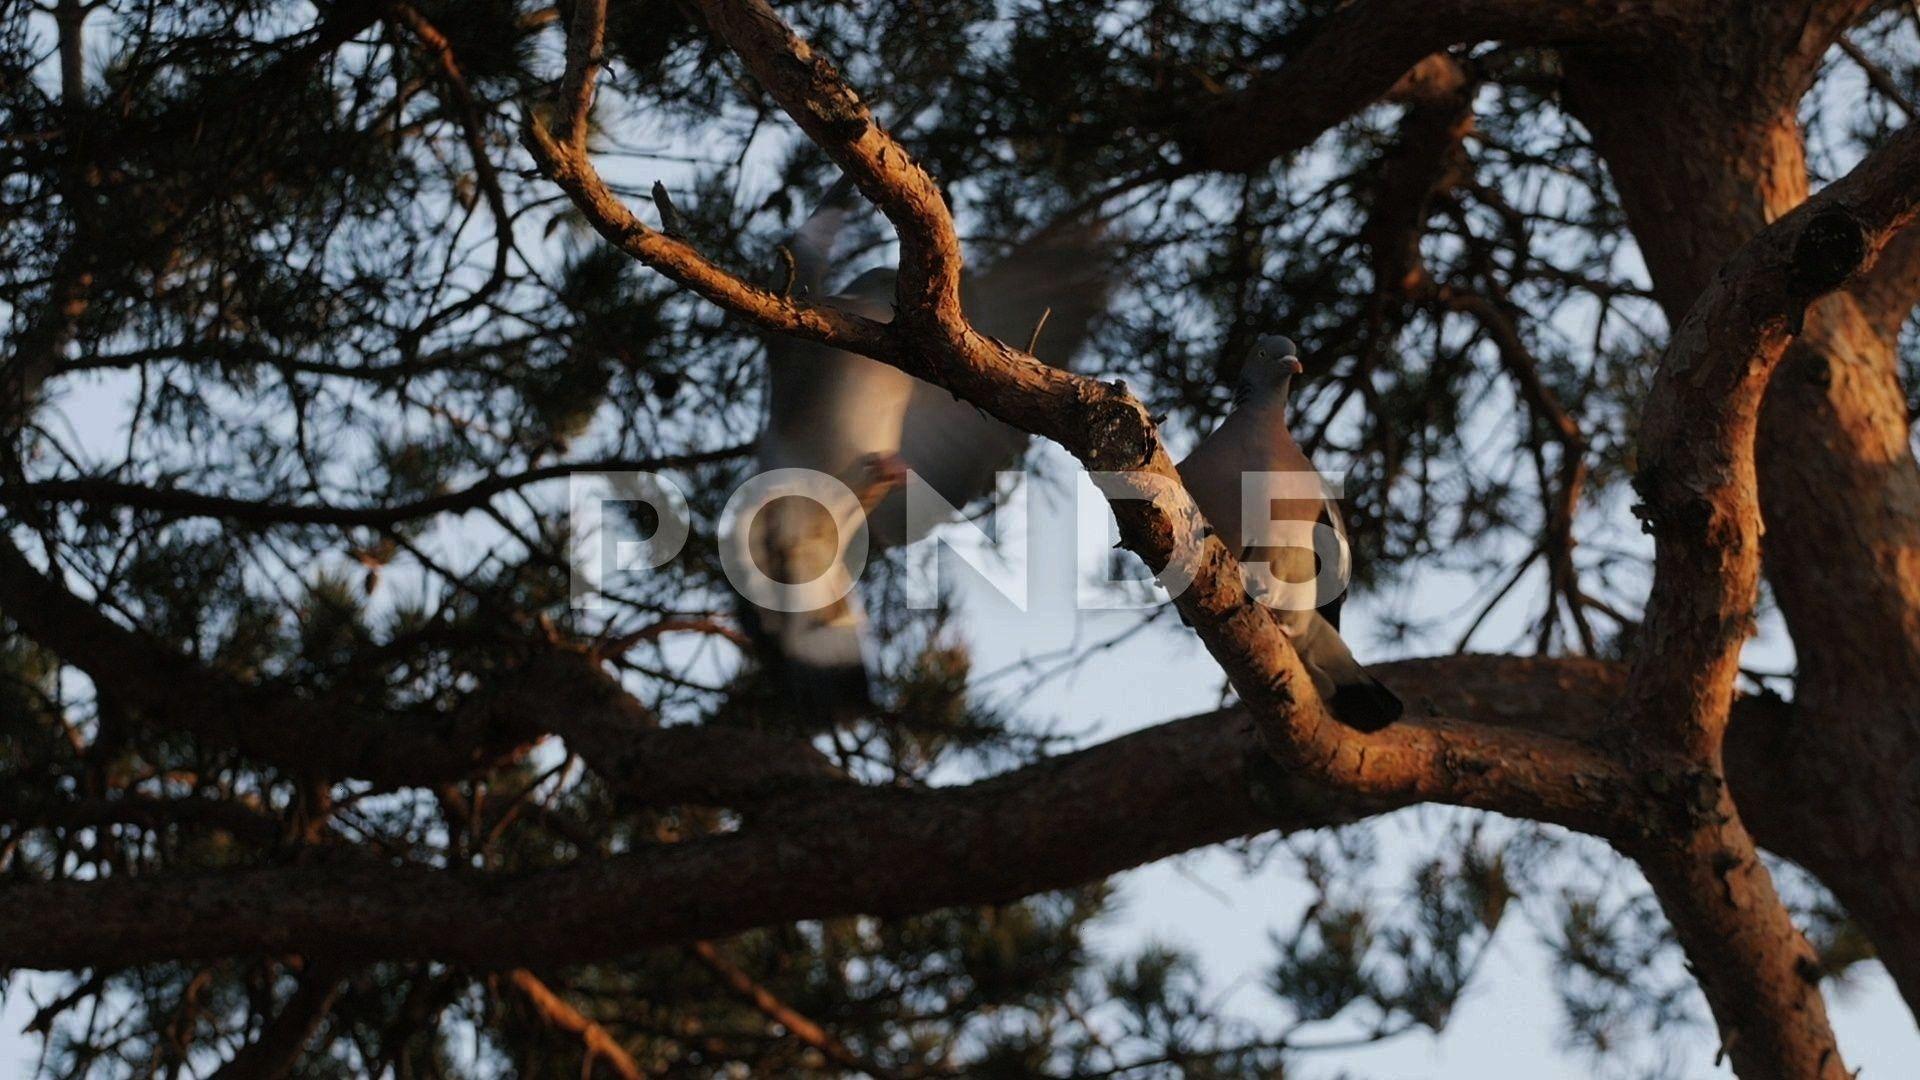 Behavior  Stock Dove Couple  Pigeons Animals Wildlife  Sweden Stock Footage StockDoveBehaviorBirdBird Courtship Behavior  Stock Dove Couple  Pigeons Animals Wildlife  Swe...